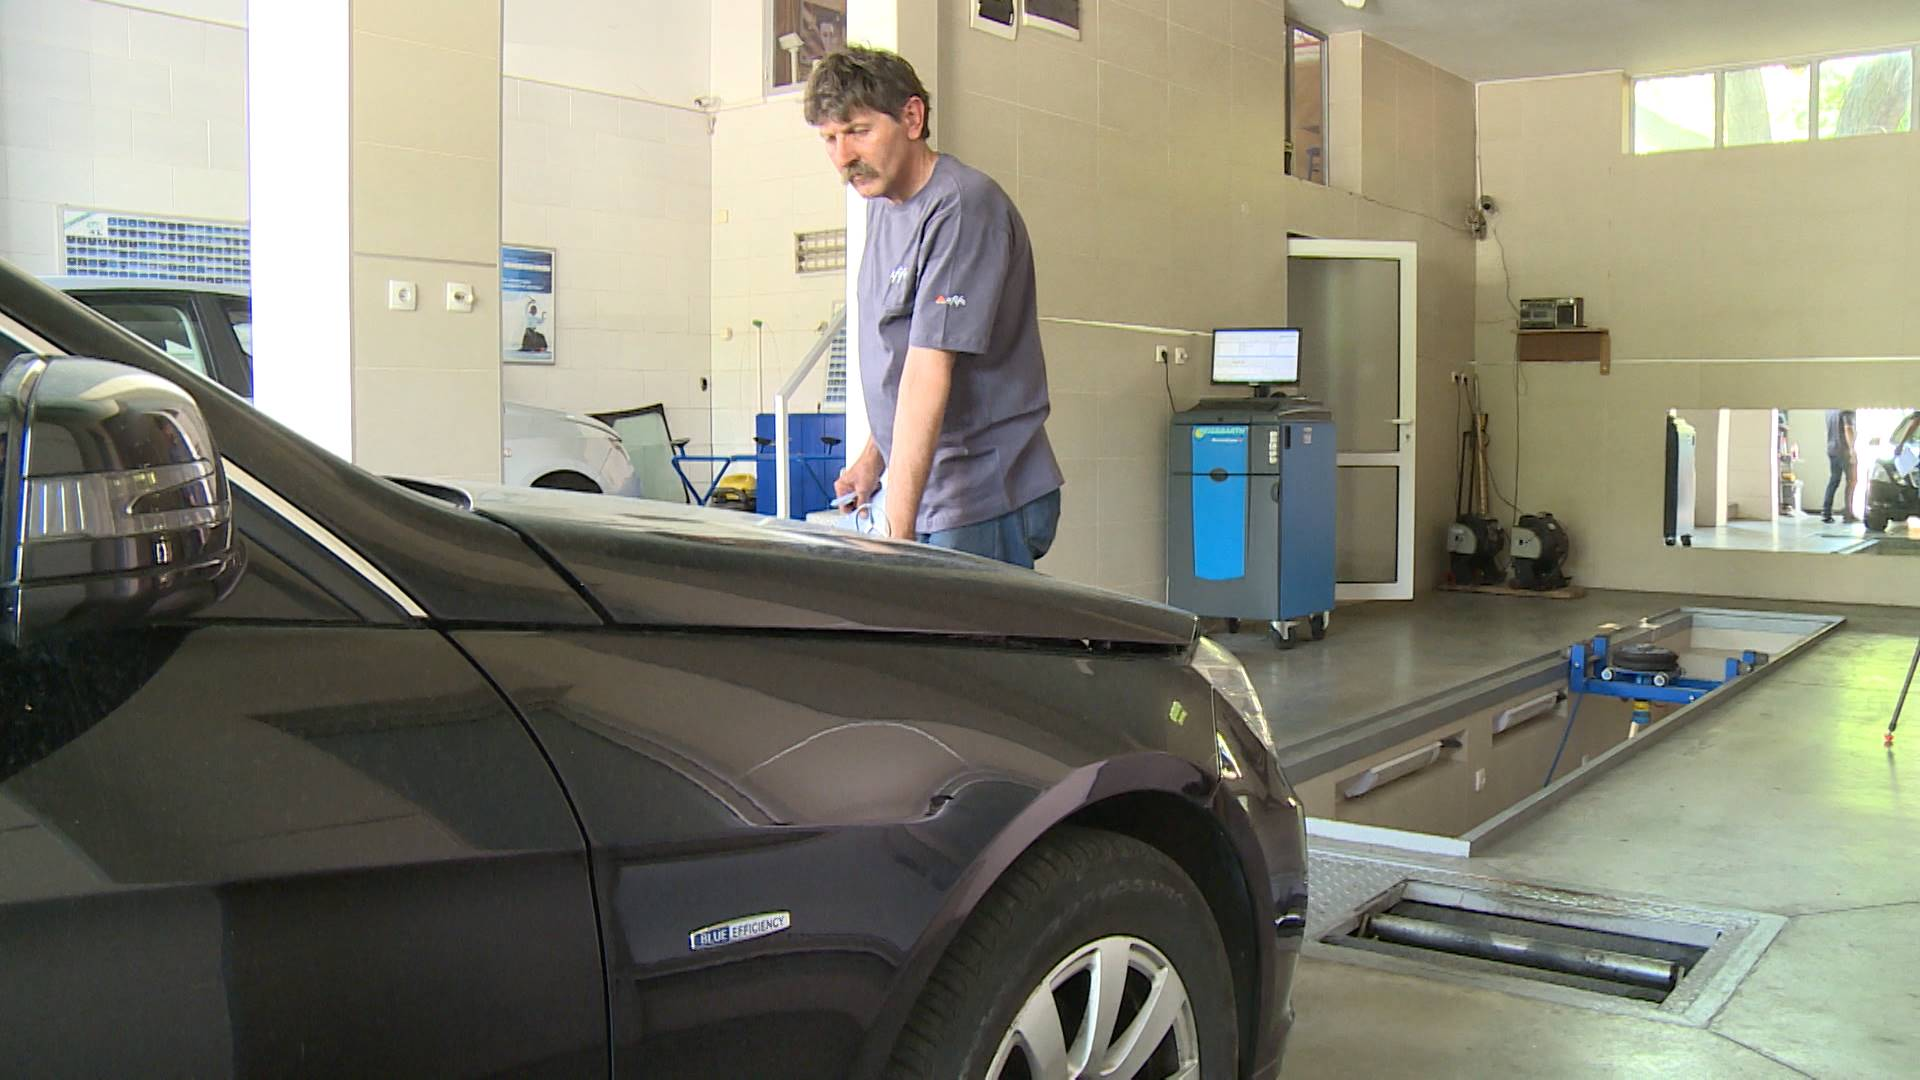 Nova pravila i nameti za vozače – brojevi šasije i motora moraju biti čitljivi